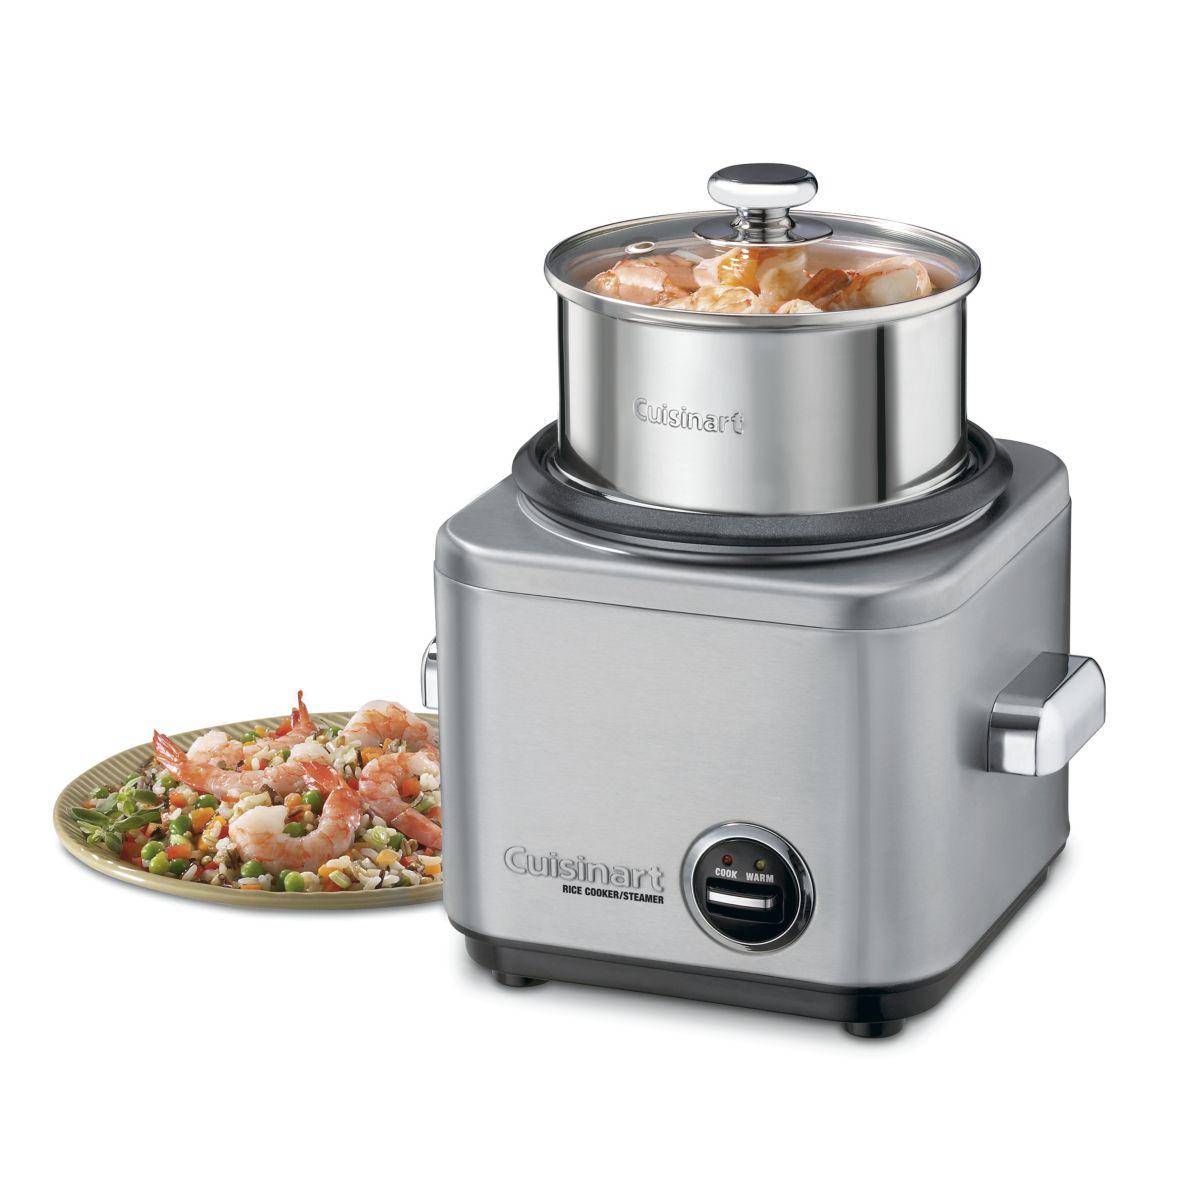 Cuiseur � riz cuisinart crc400e (photo)